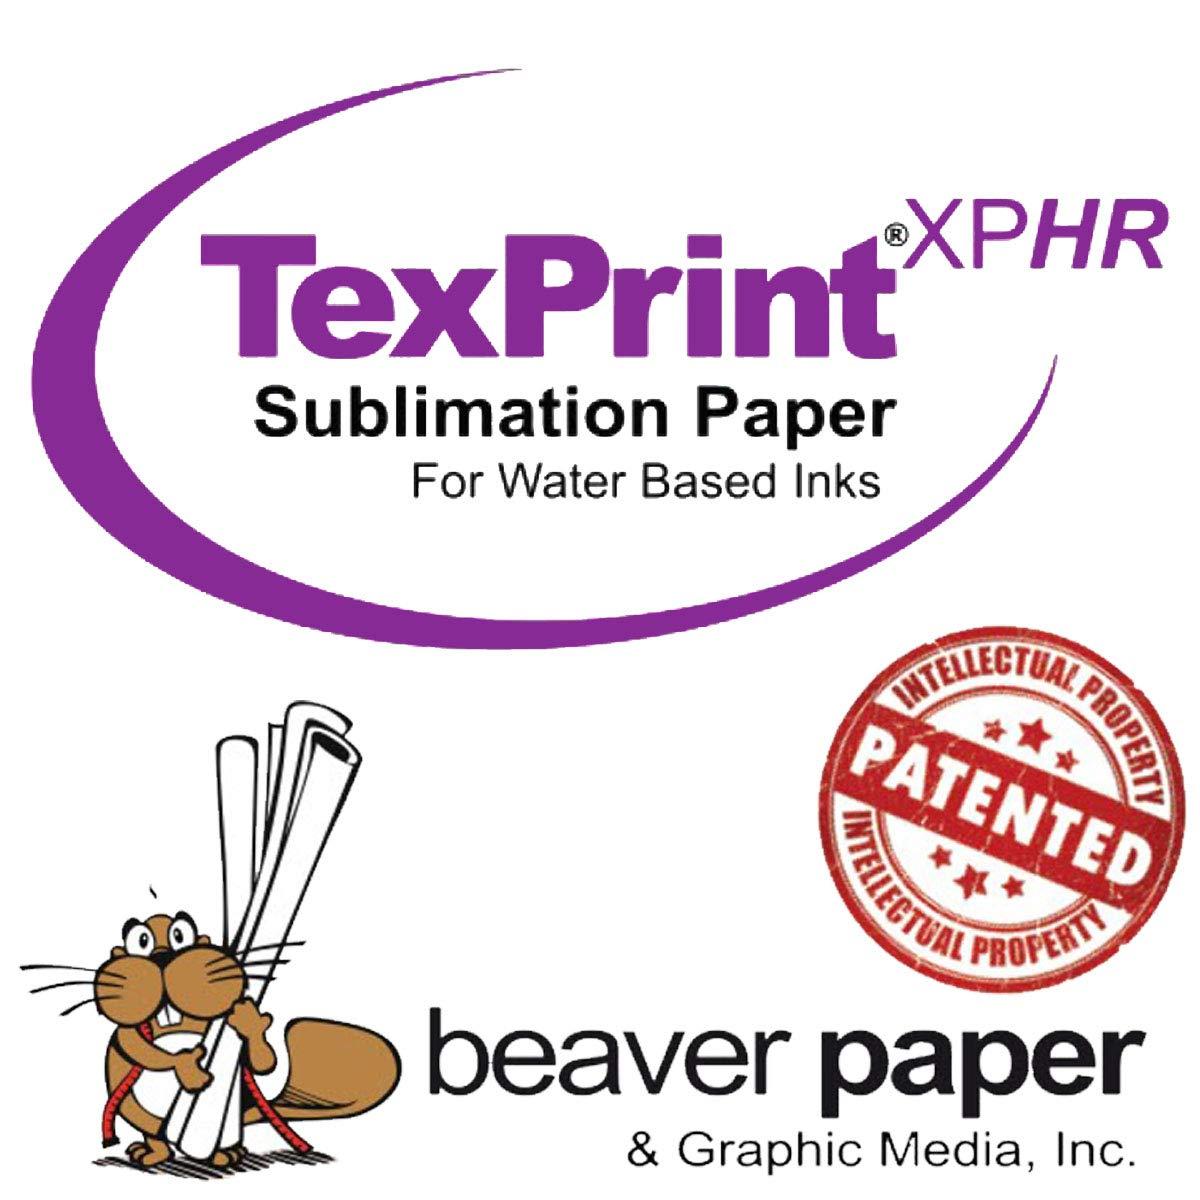 TexPrint XP HR Sublimation Transfer Paper 8.5'' x 11'', 110 Sheet Pack